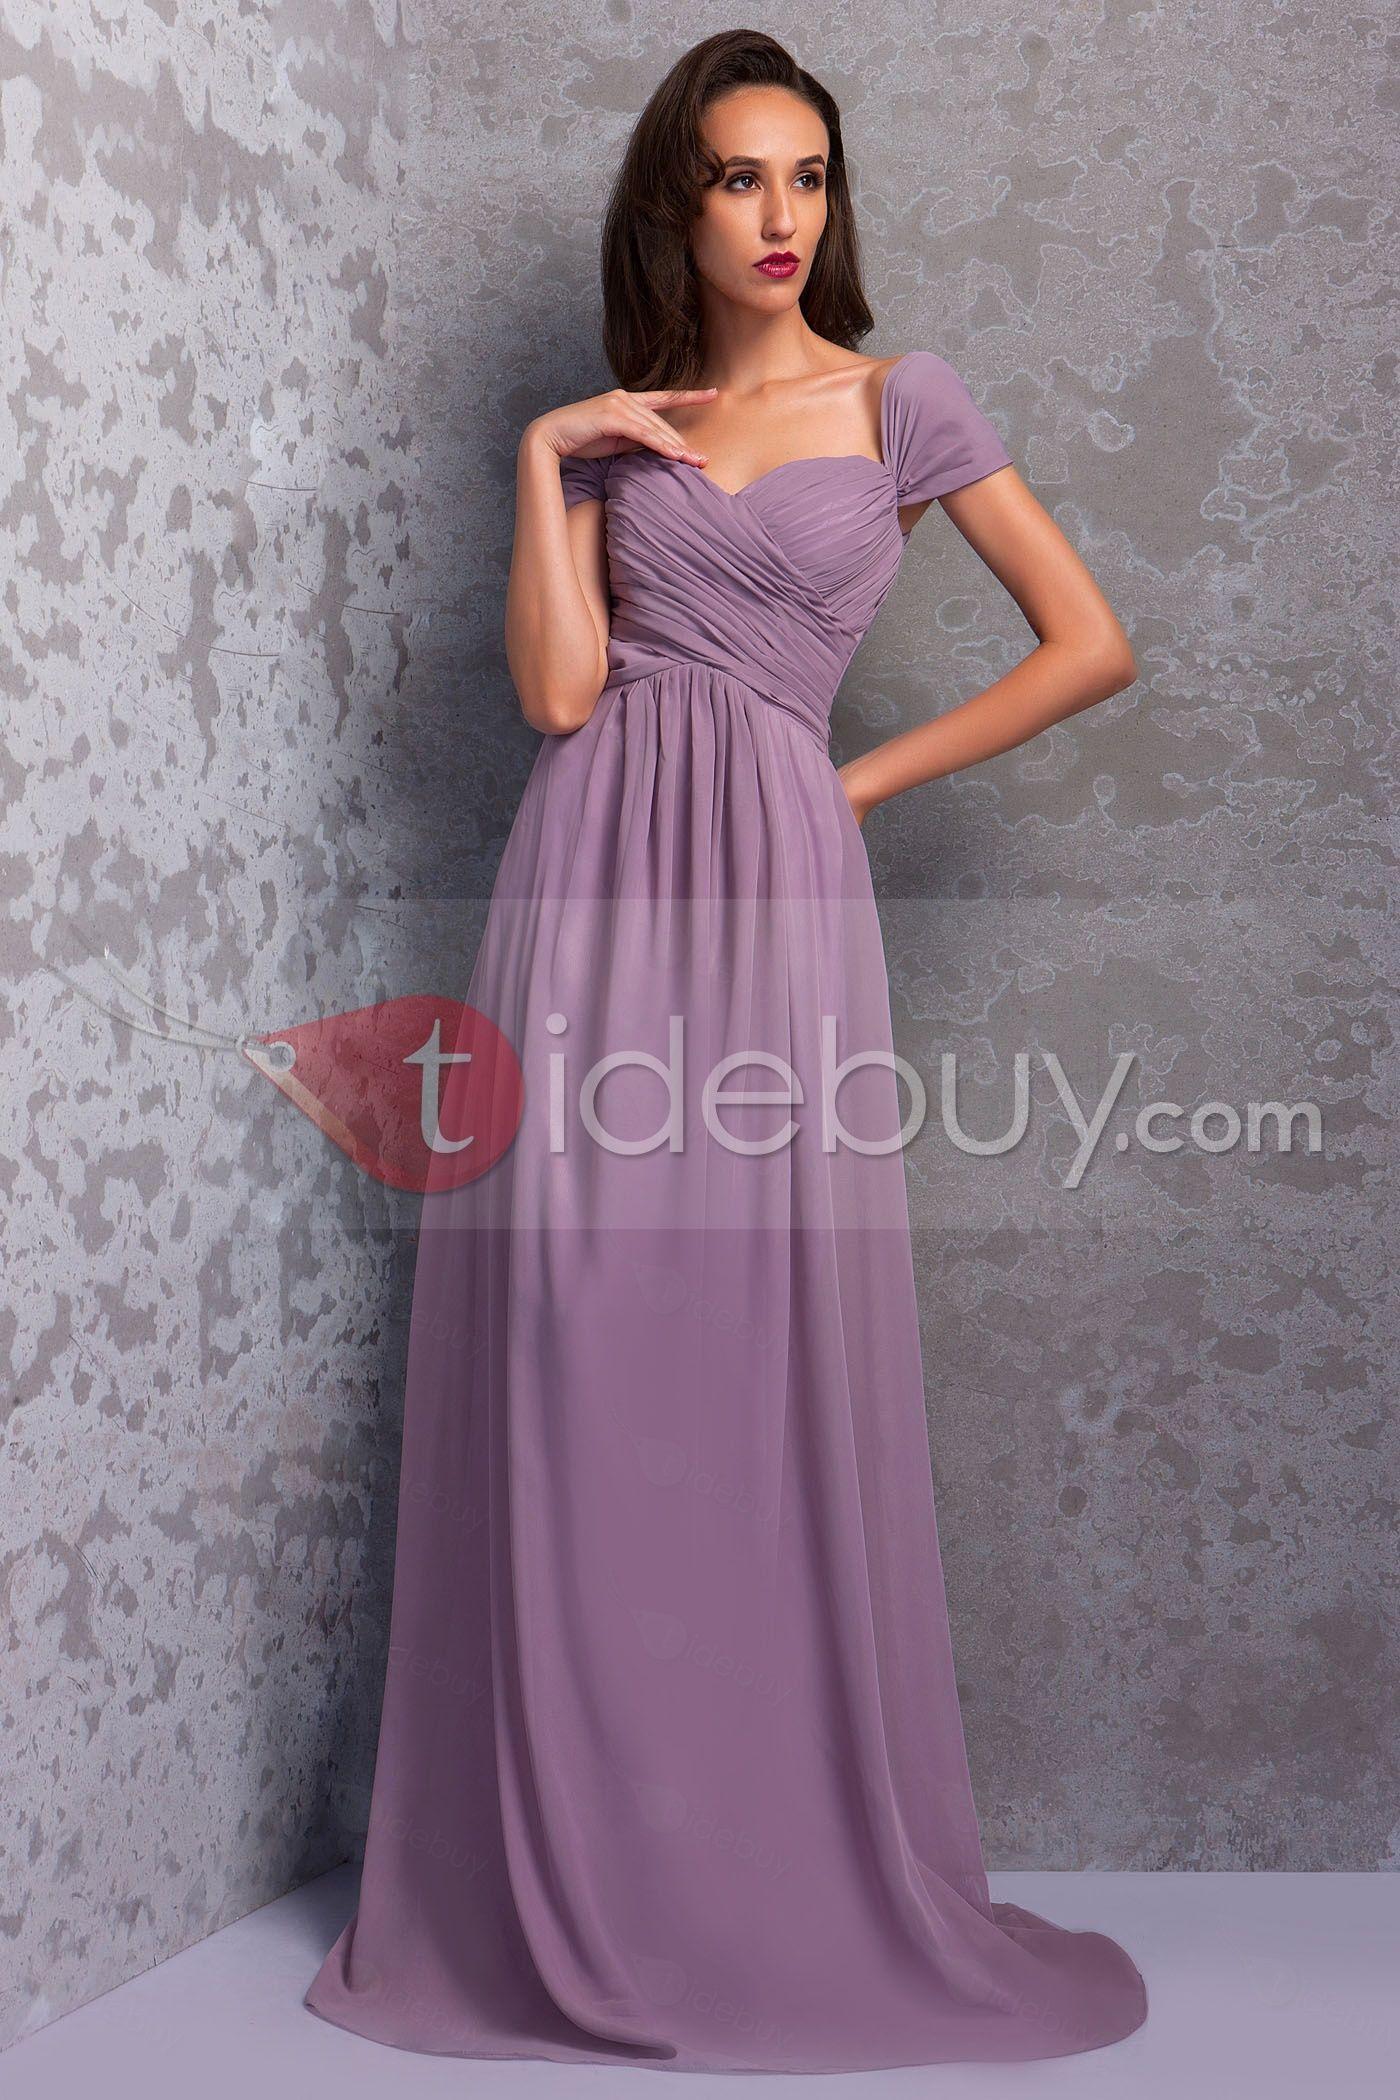 Graceful Pleats A-Line Floor-Length Renata\'s Bridesmaid/Formal Dress ...